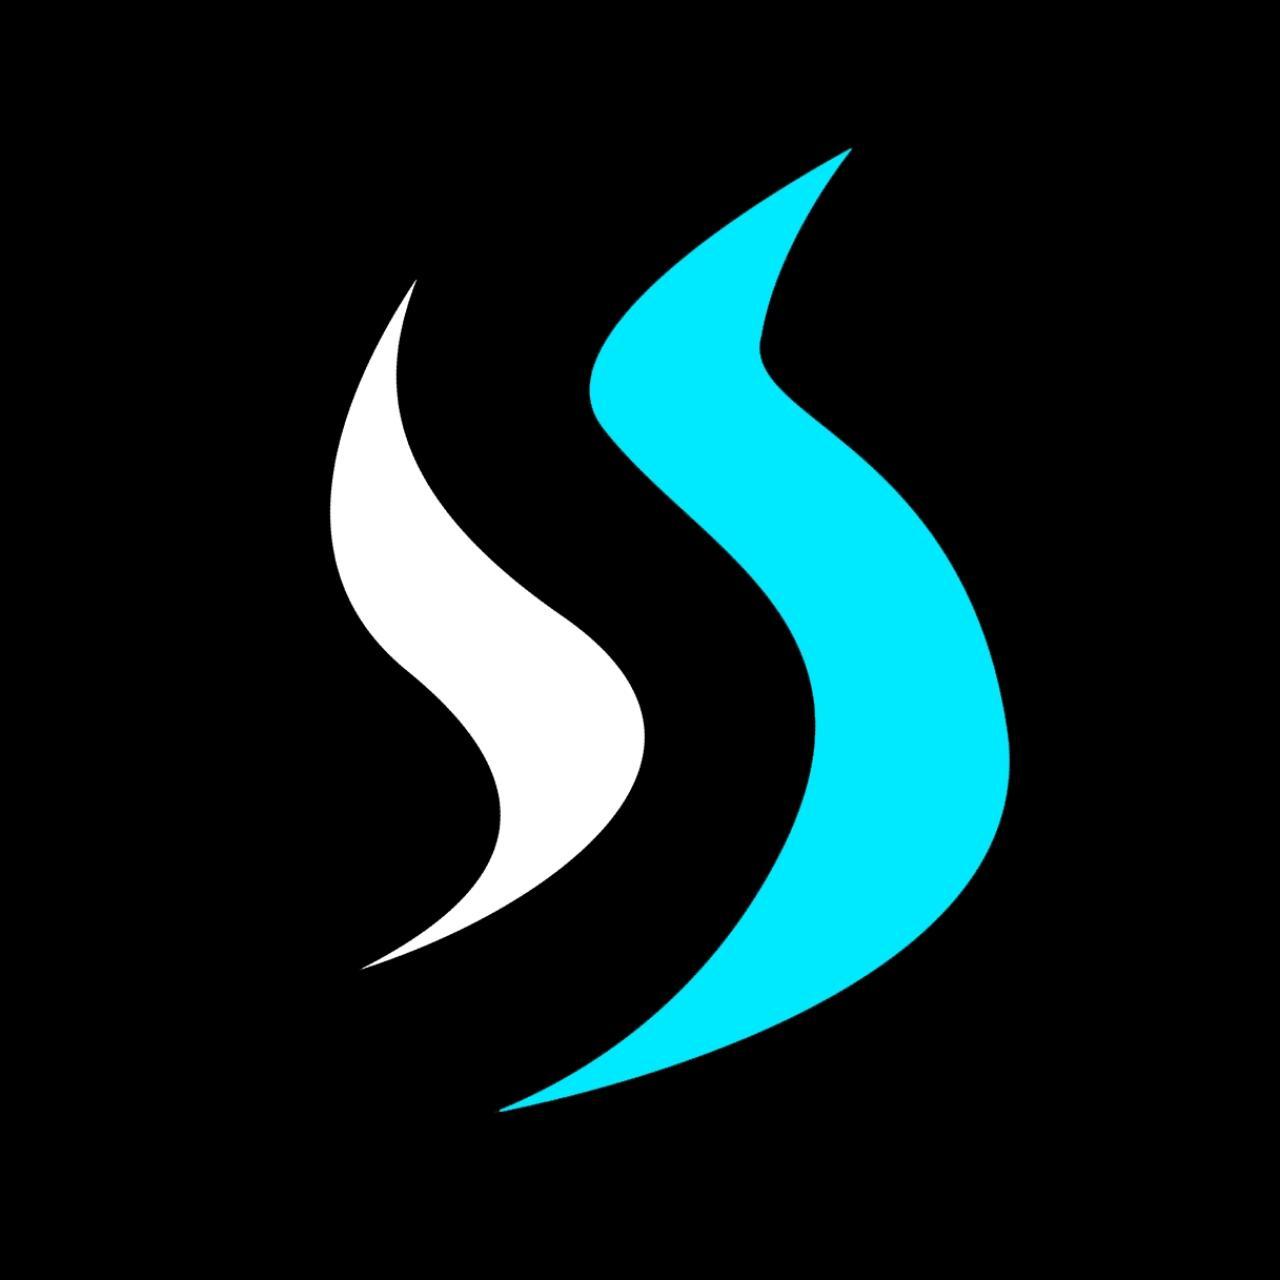 Home Design 3d Full Version Apk Youtube: Ss Logo Images Hd